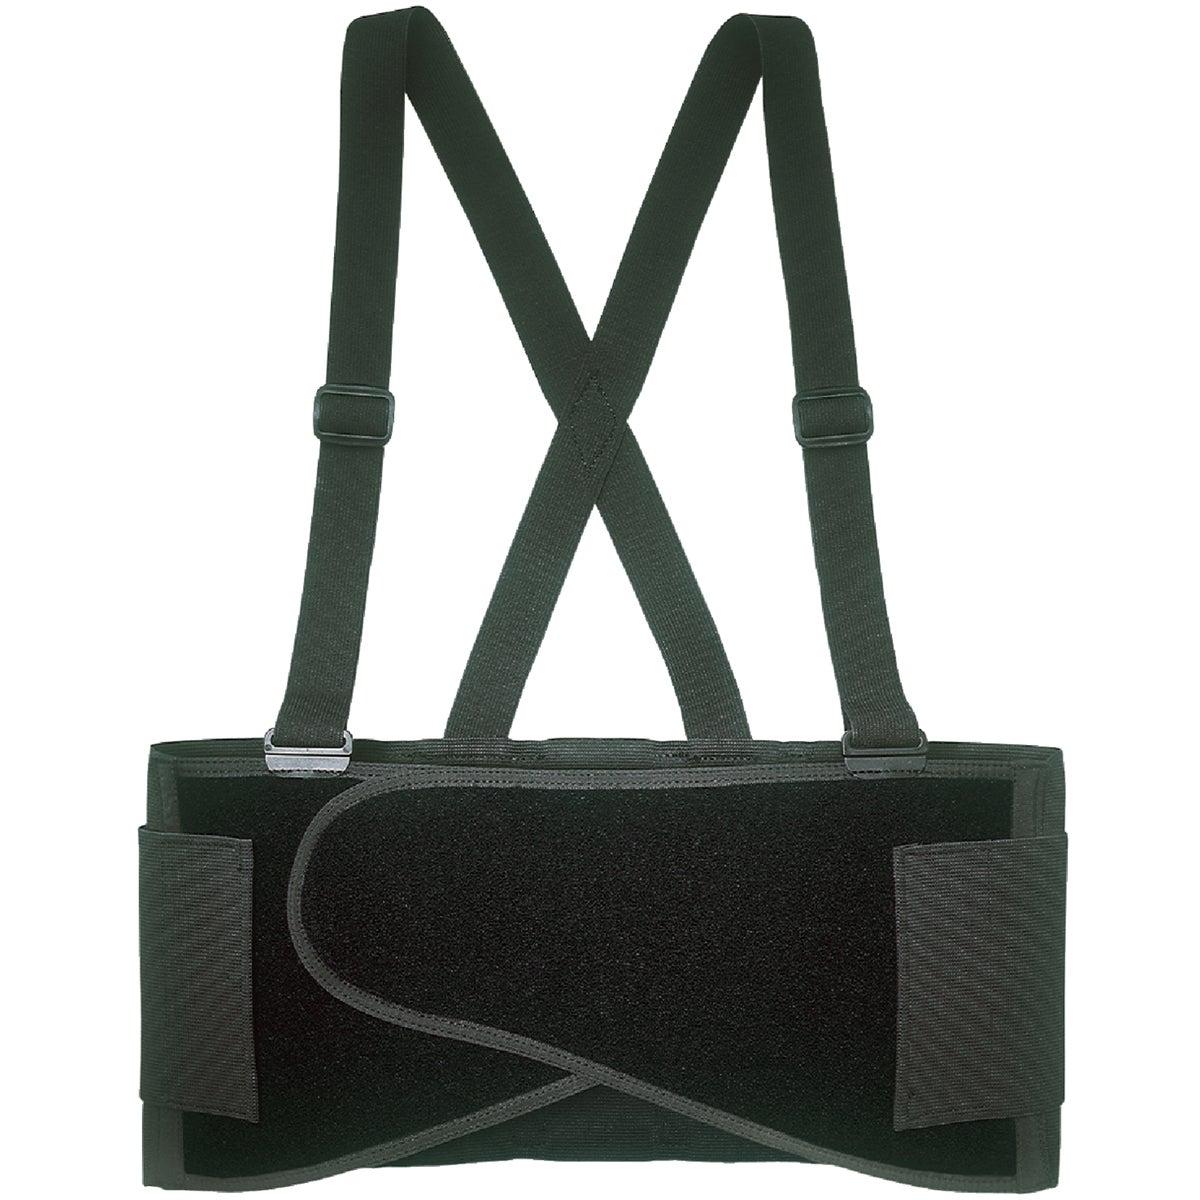 Custom Leathercraft 5000M Elastic Back Support Belt Fits Waists, 32-Inch to 3...